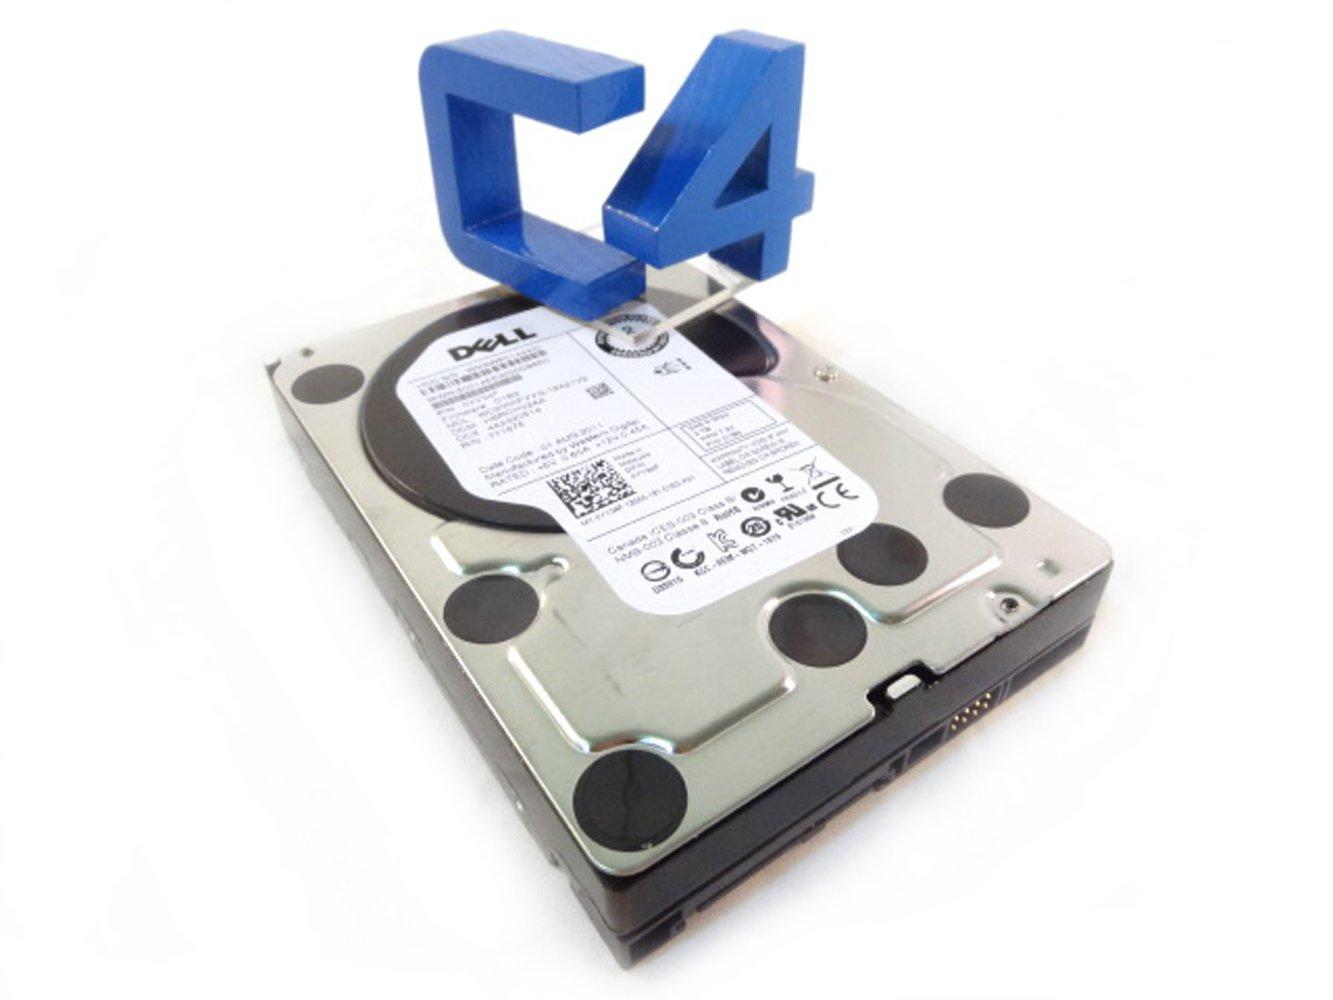 1TB 3.5-inch 7.2K RPM Near Line 6Gbps SAS Hard Drive -Non Hotplug Kit for sale